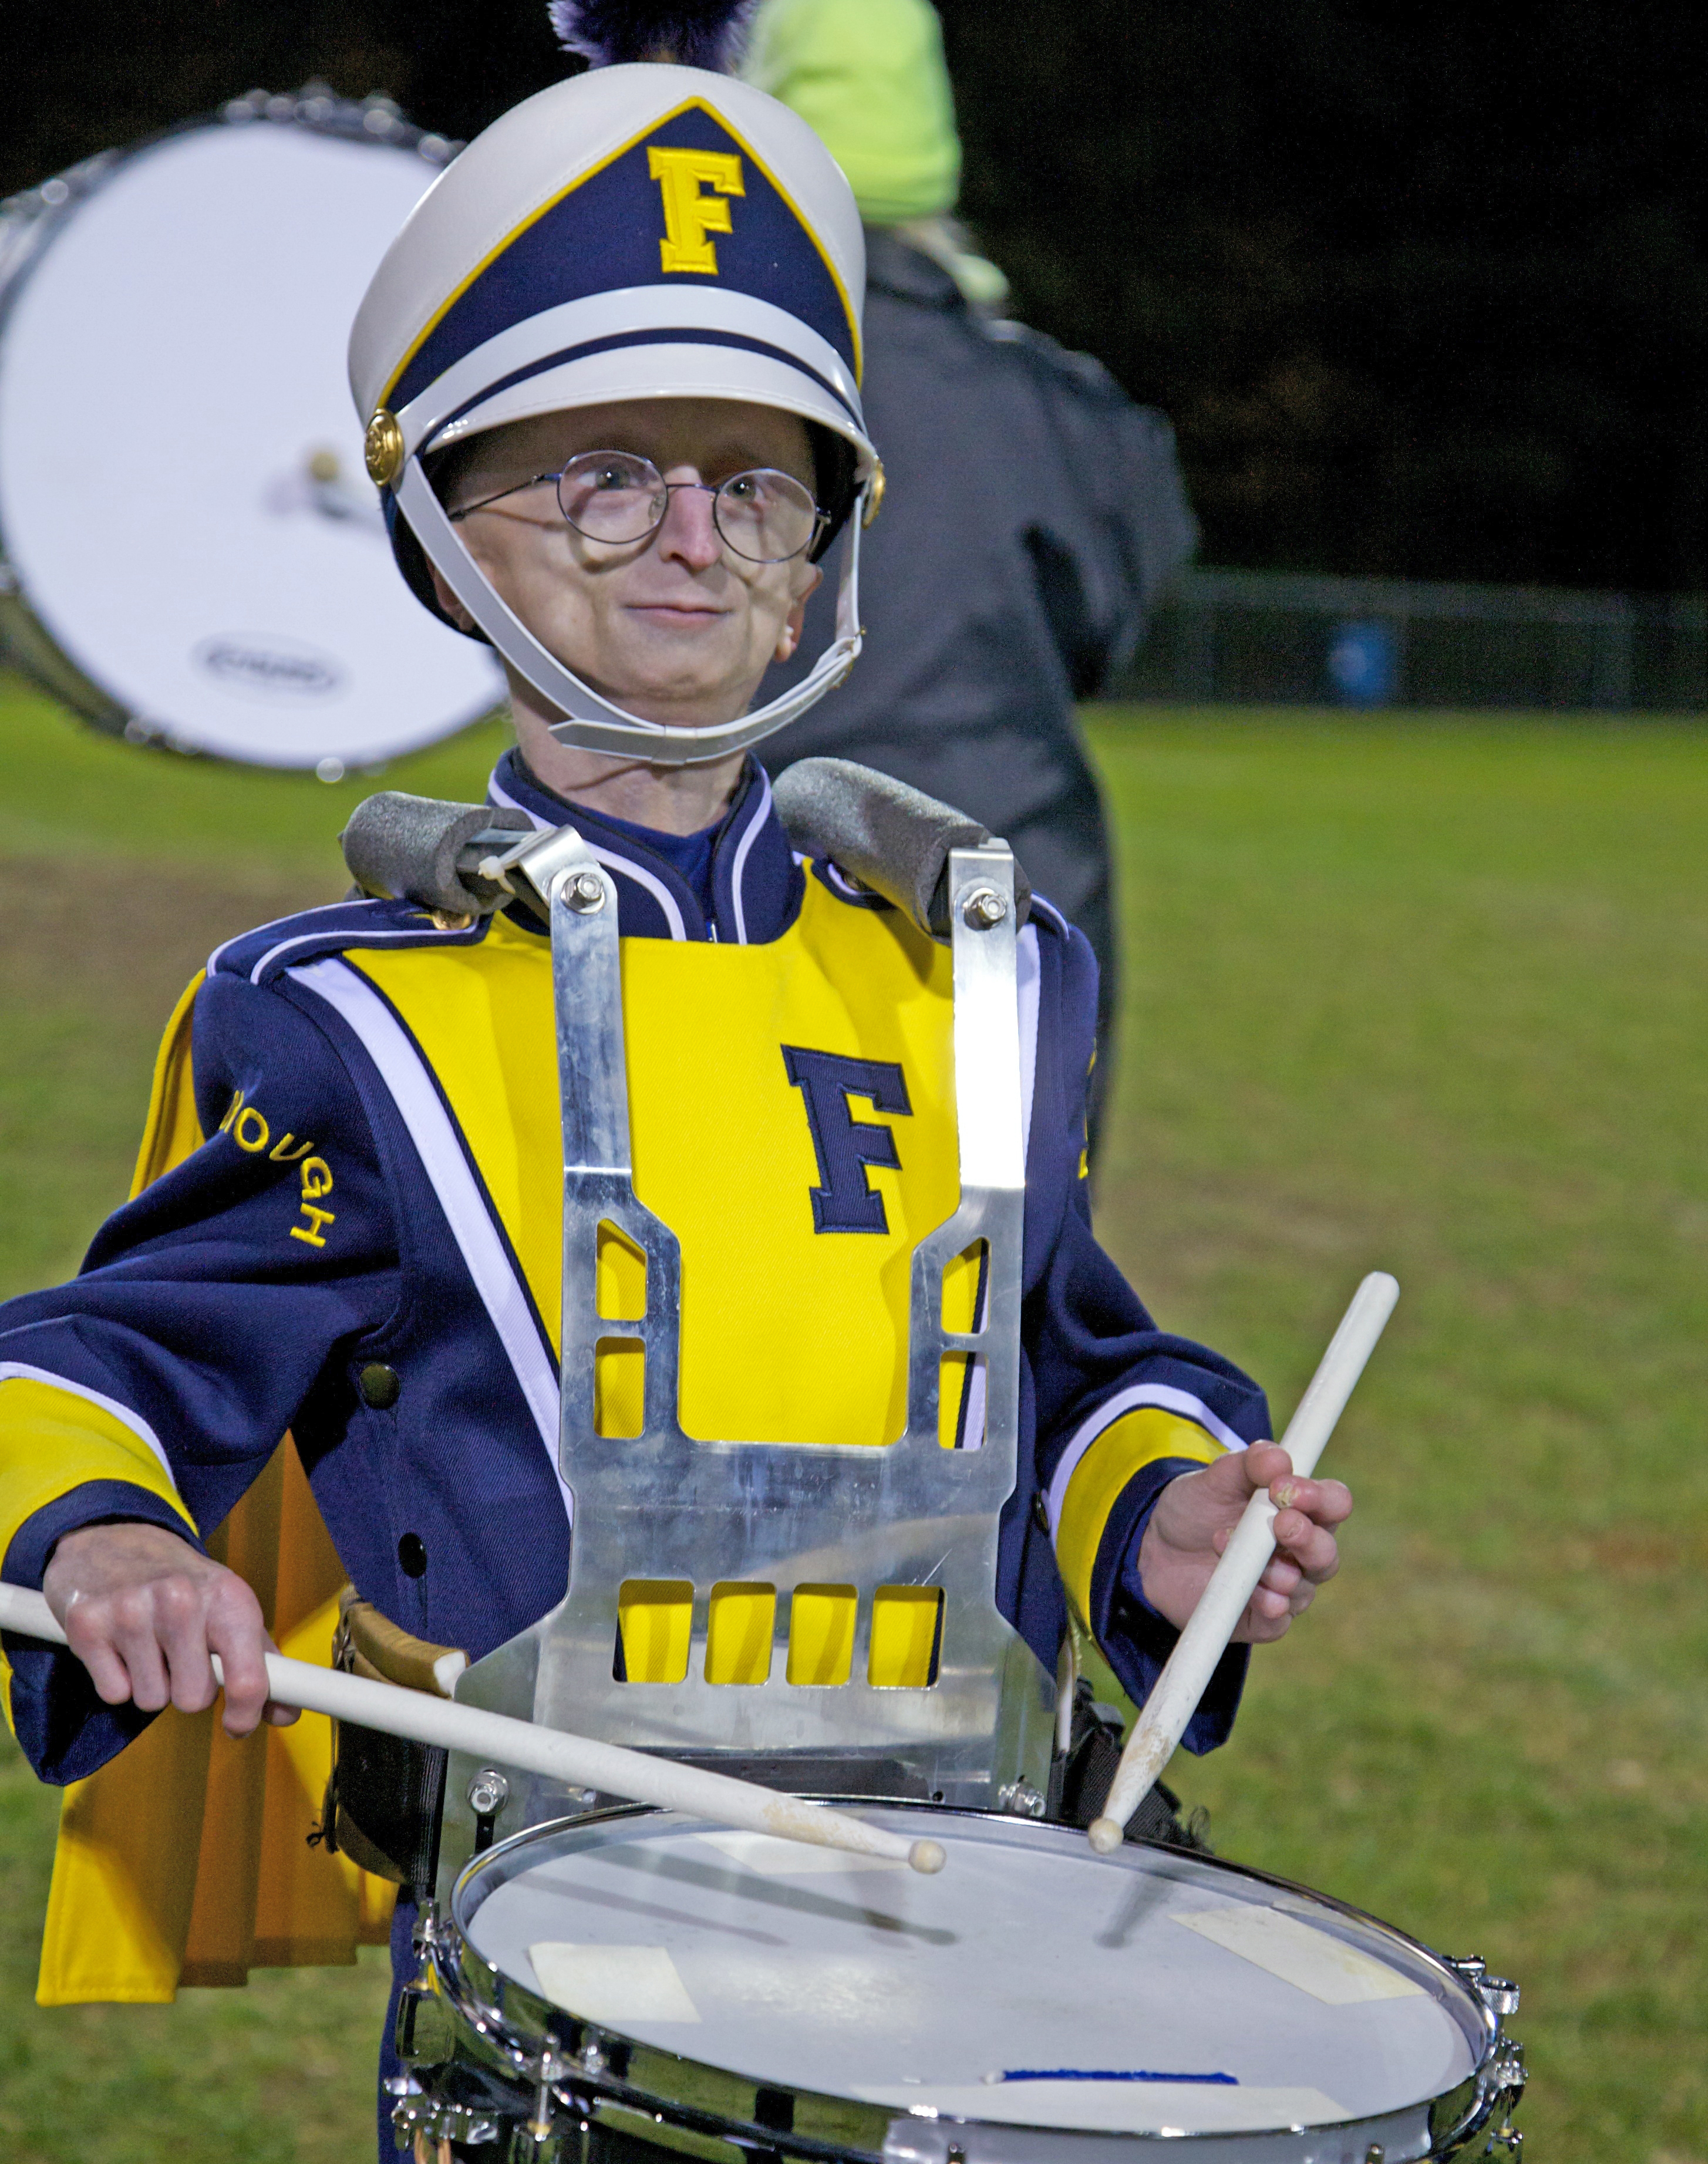 Sam Berns, Teen Known For His Fight Against 'Aging Disease,' Dies